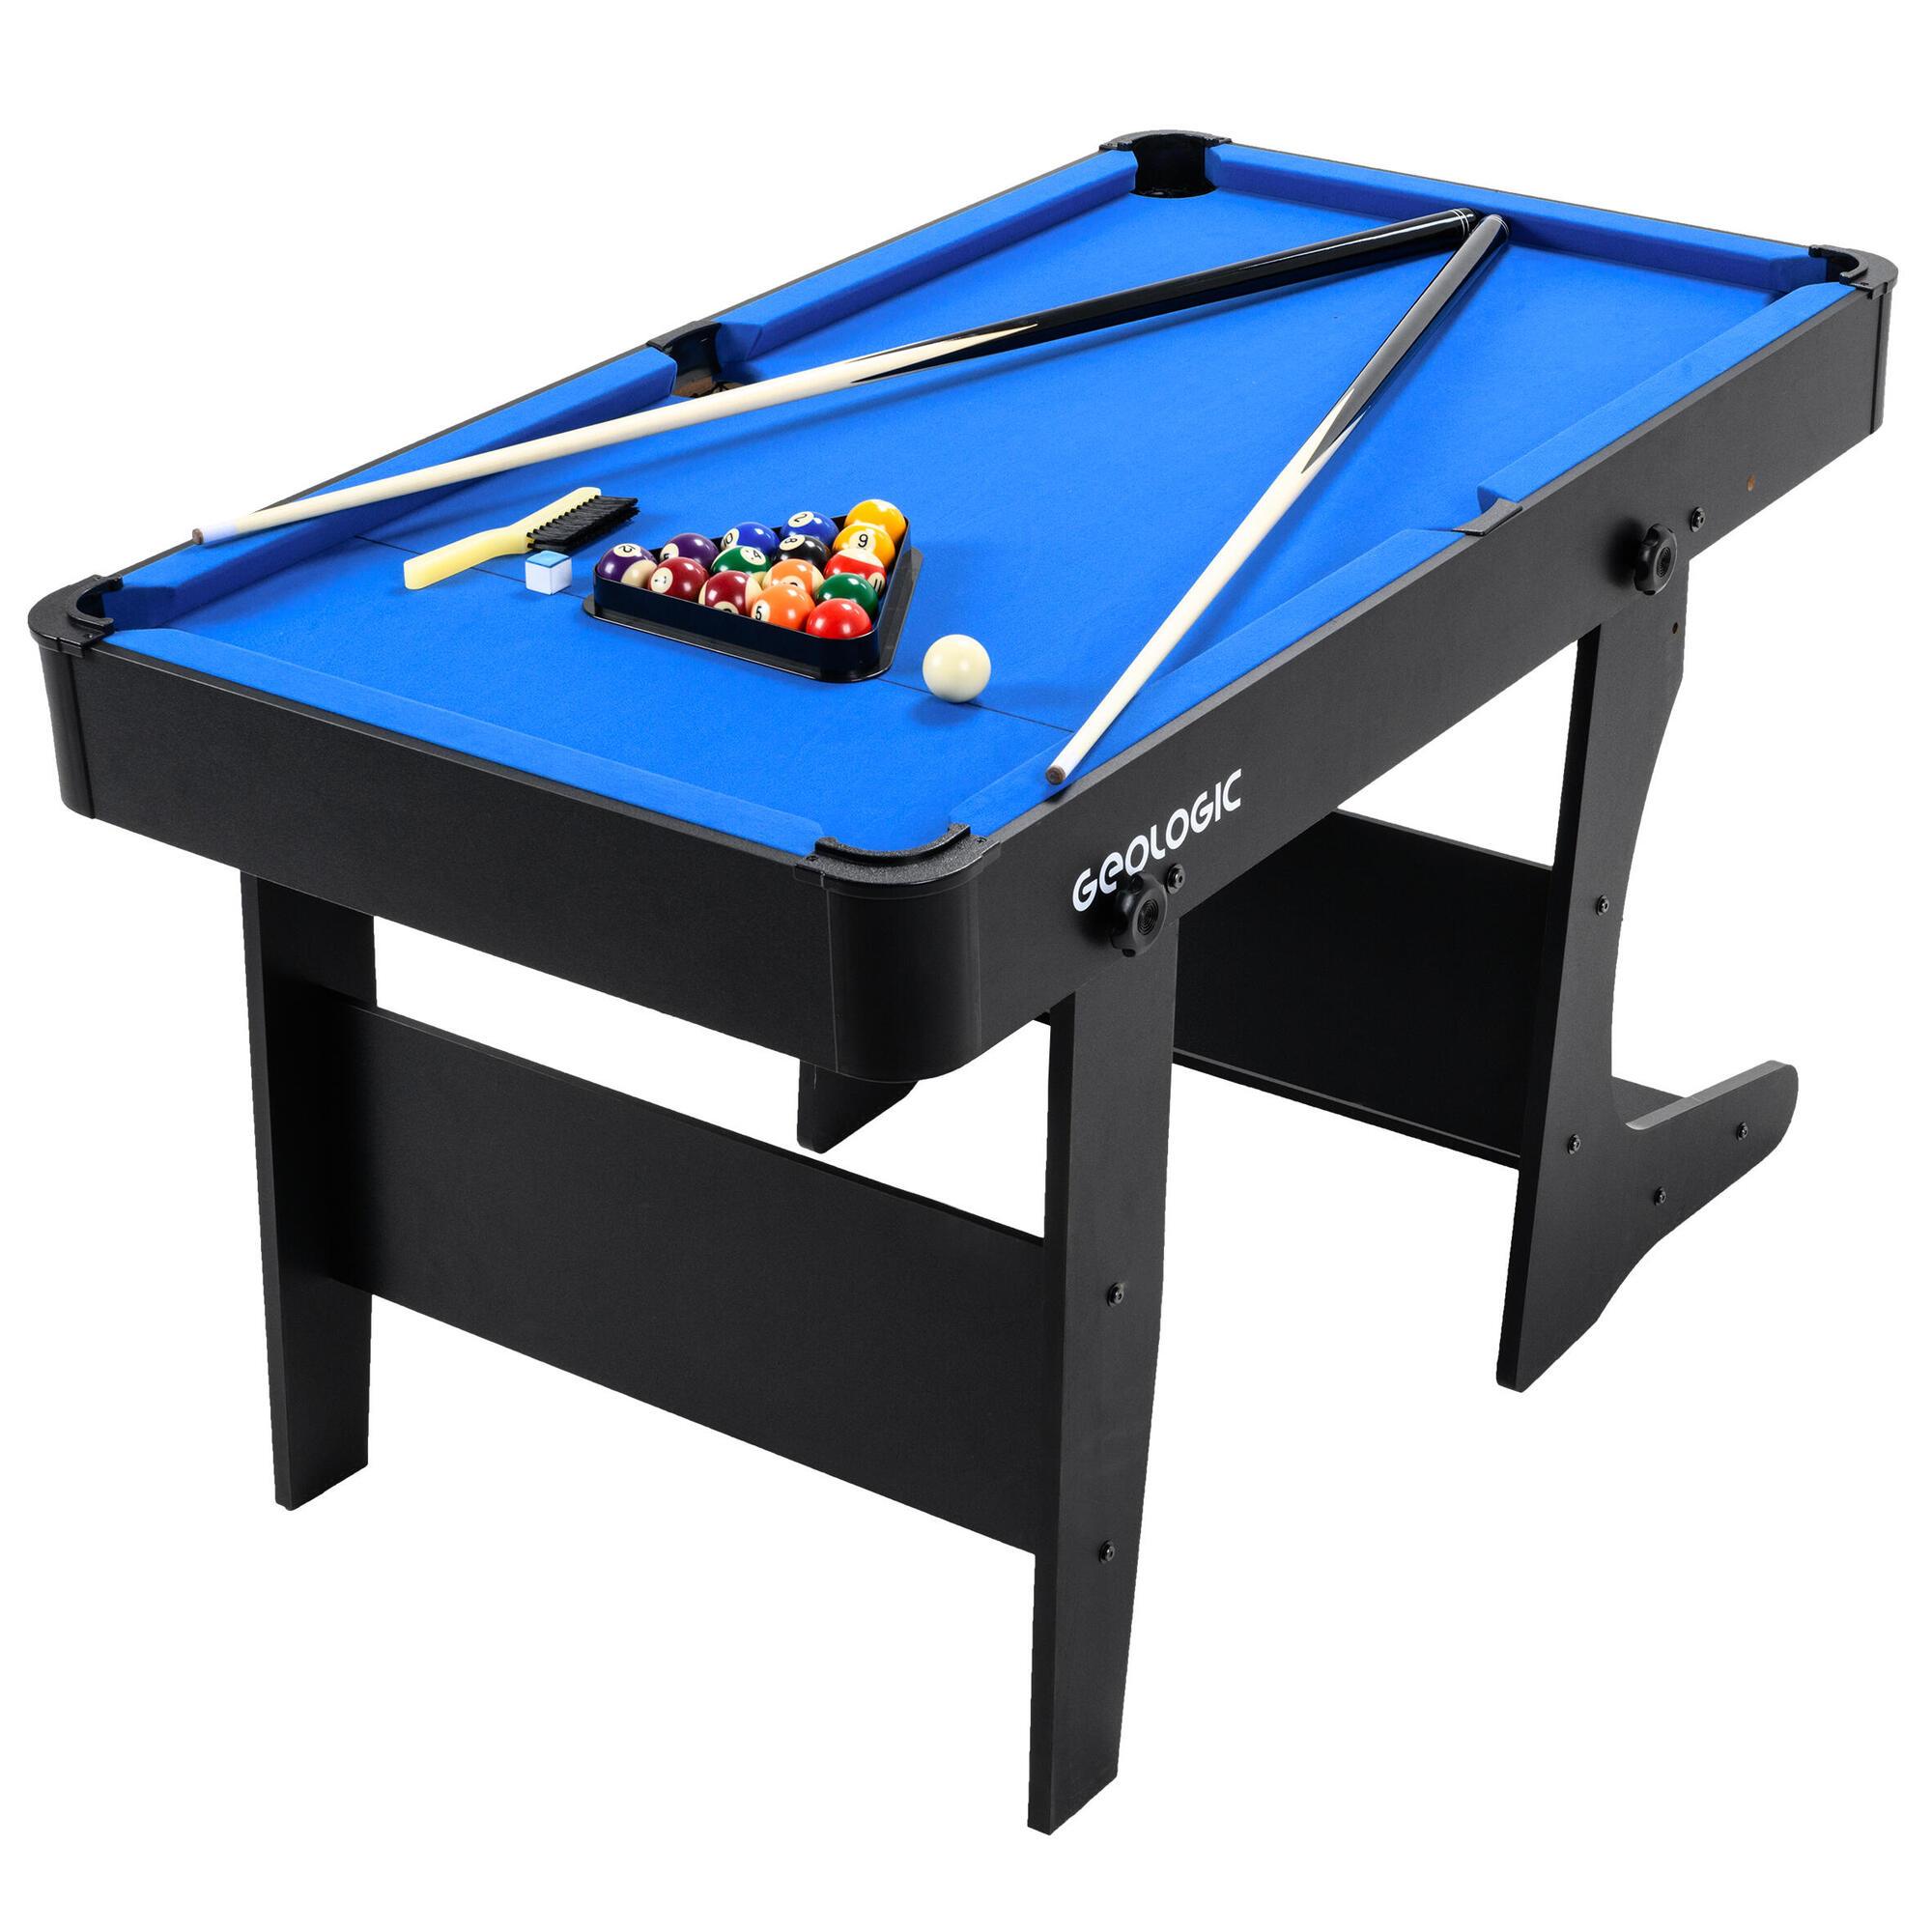 Pool - BT 6 Billiards Kit